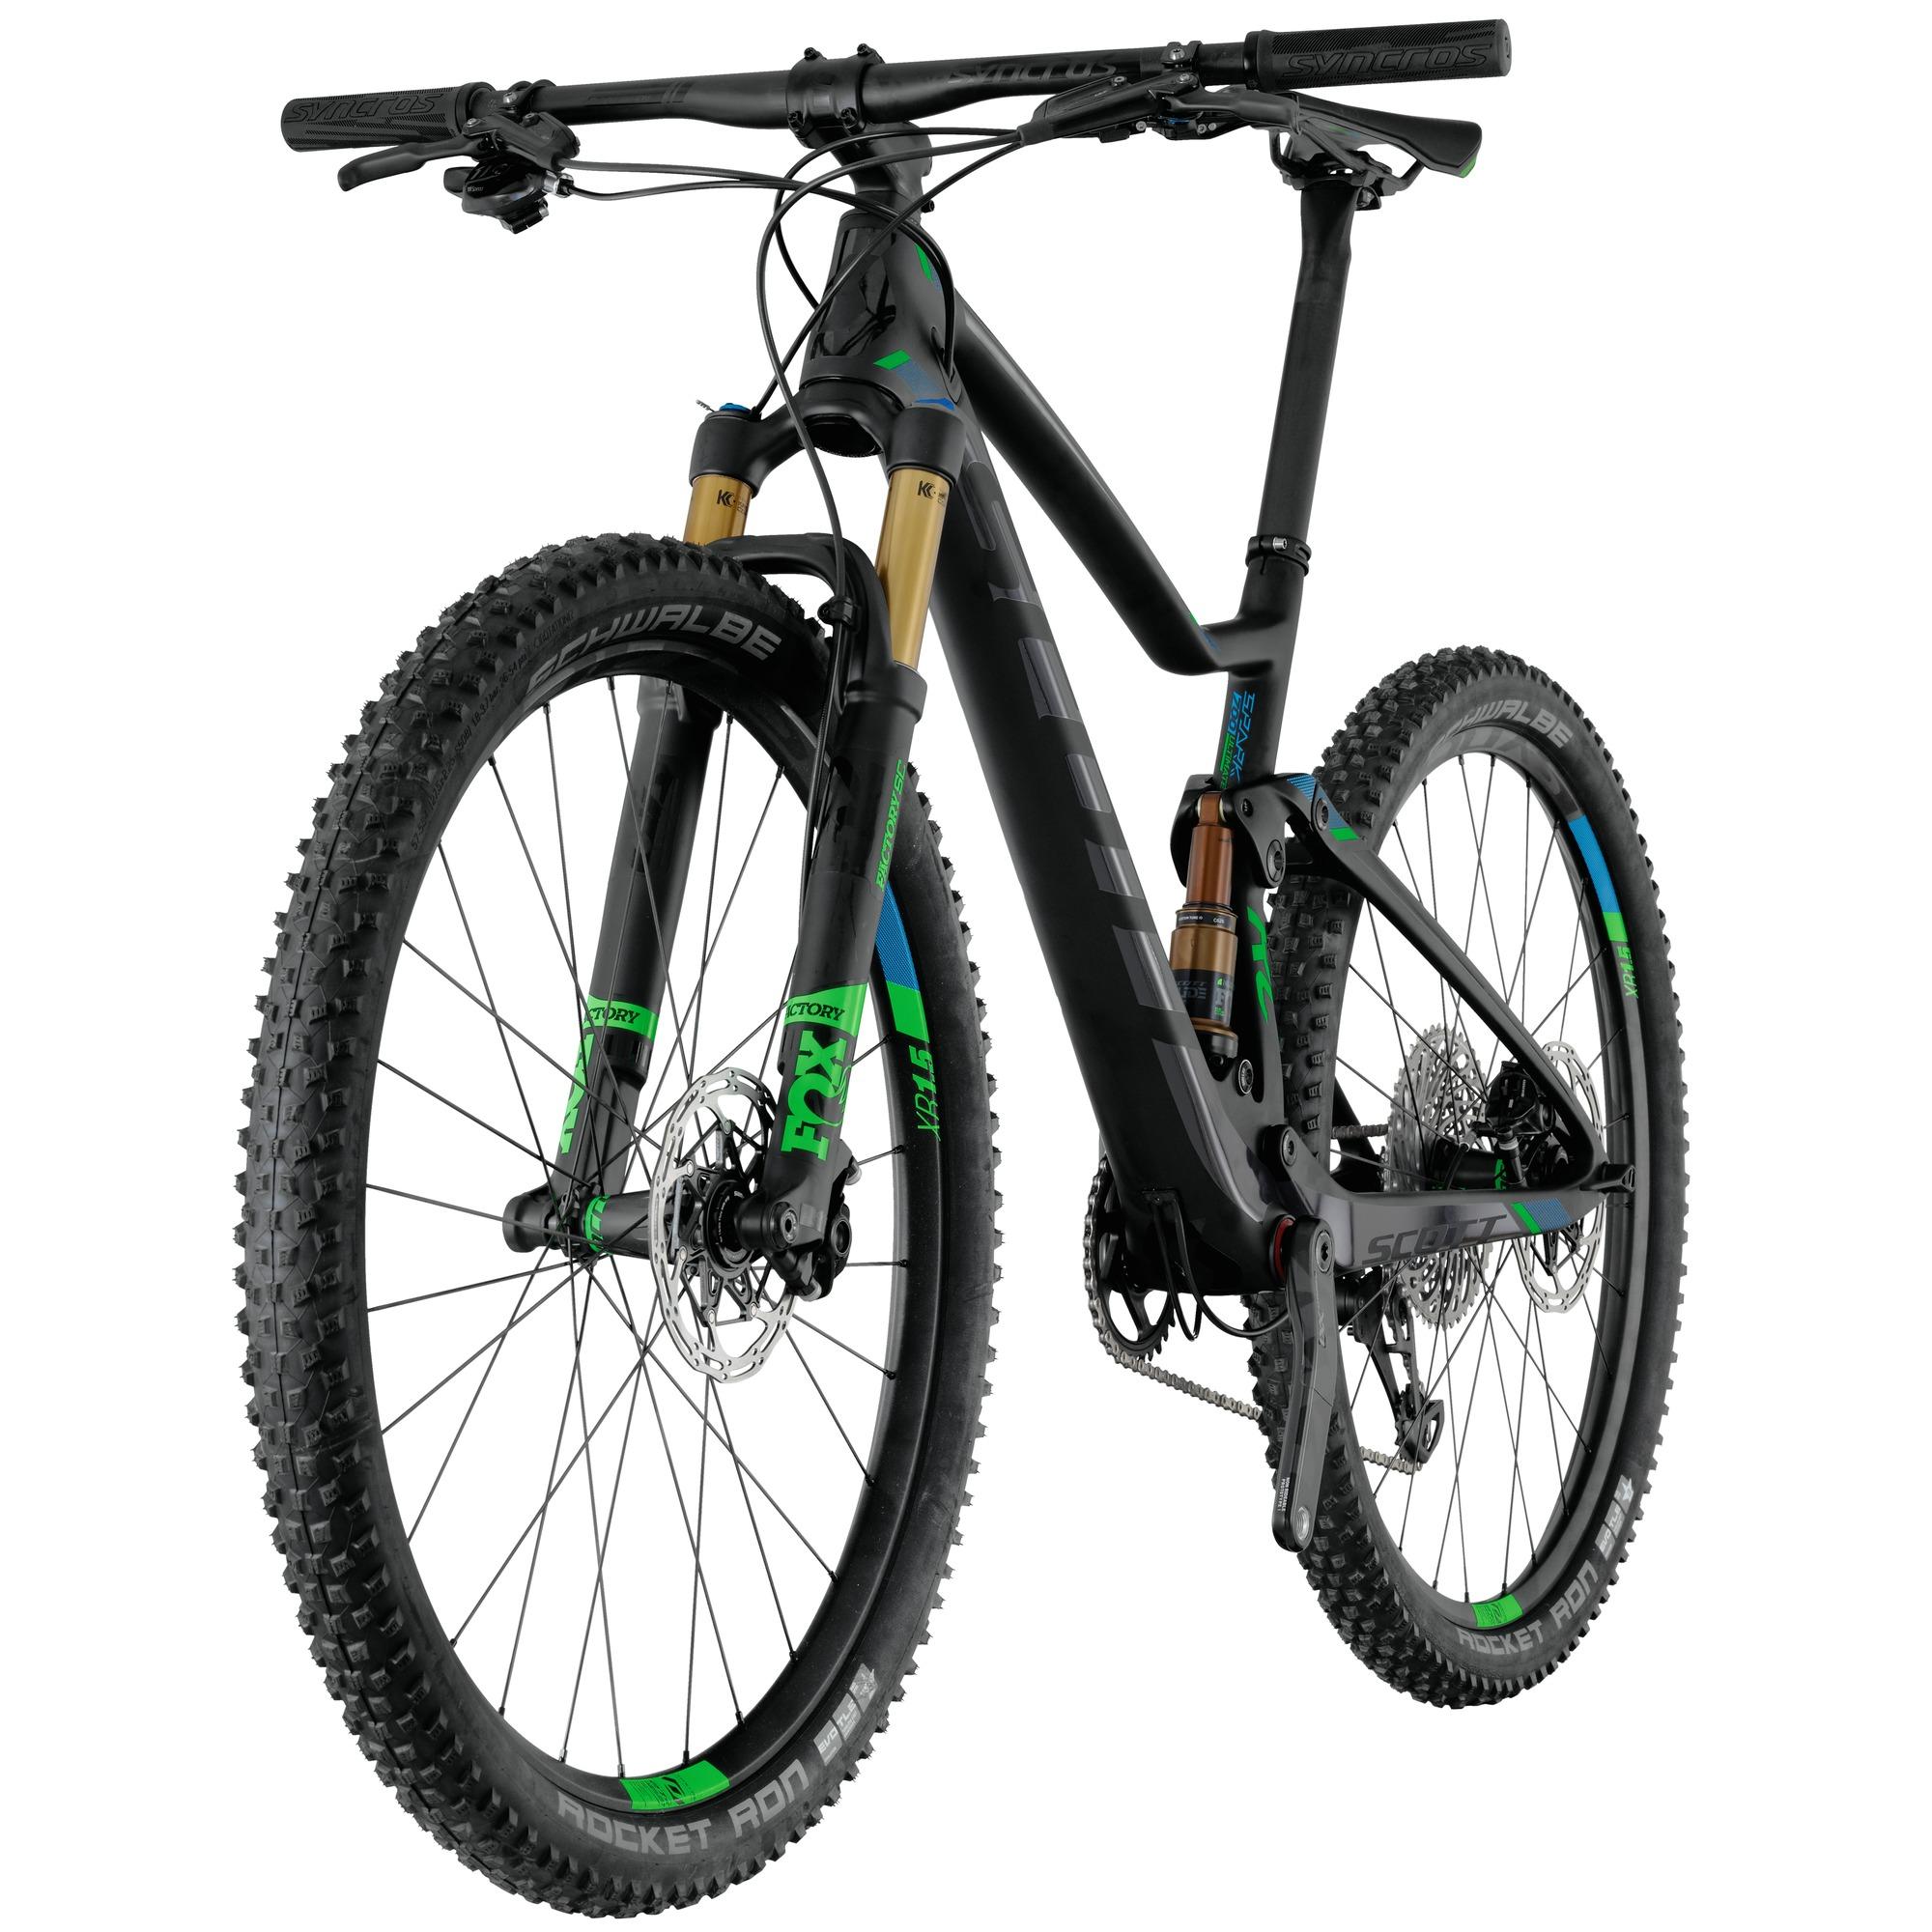 2017 Scott Spark RC 700 Ultimate Carbon Mountain Bike £6,899.00